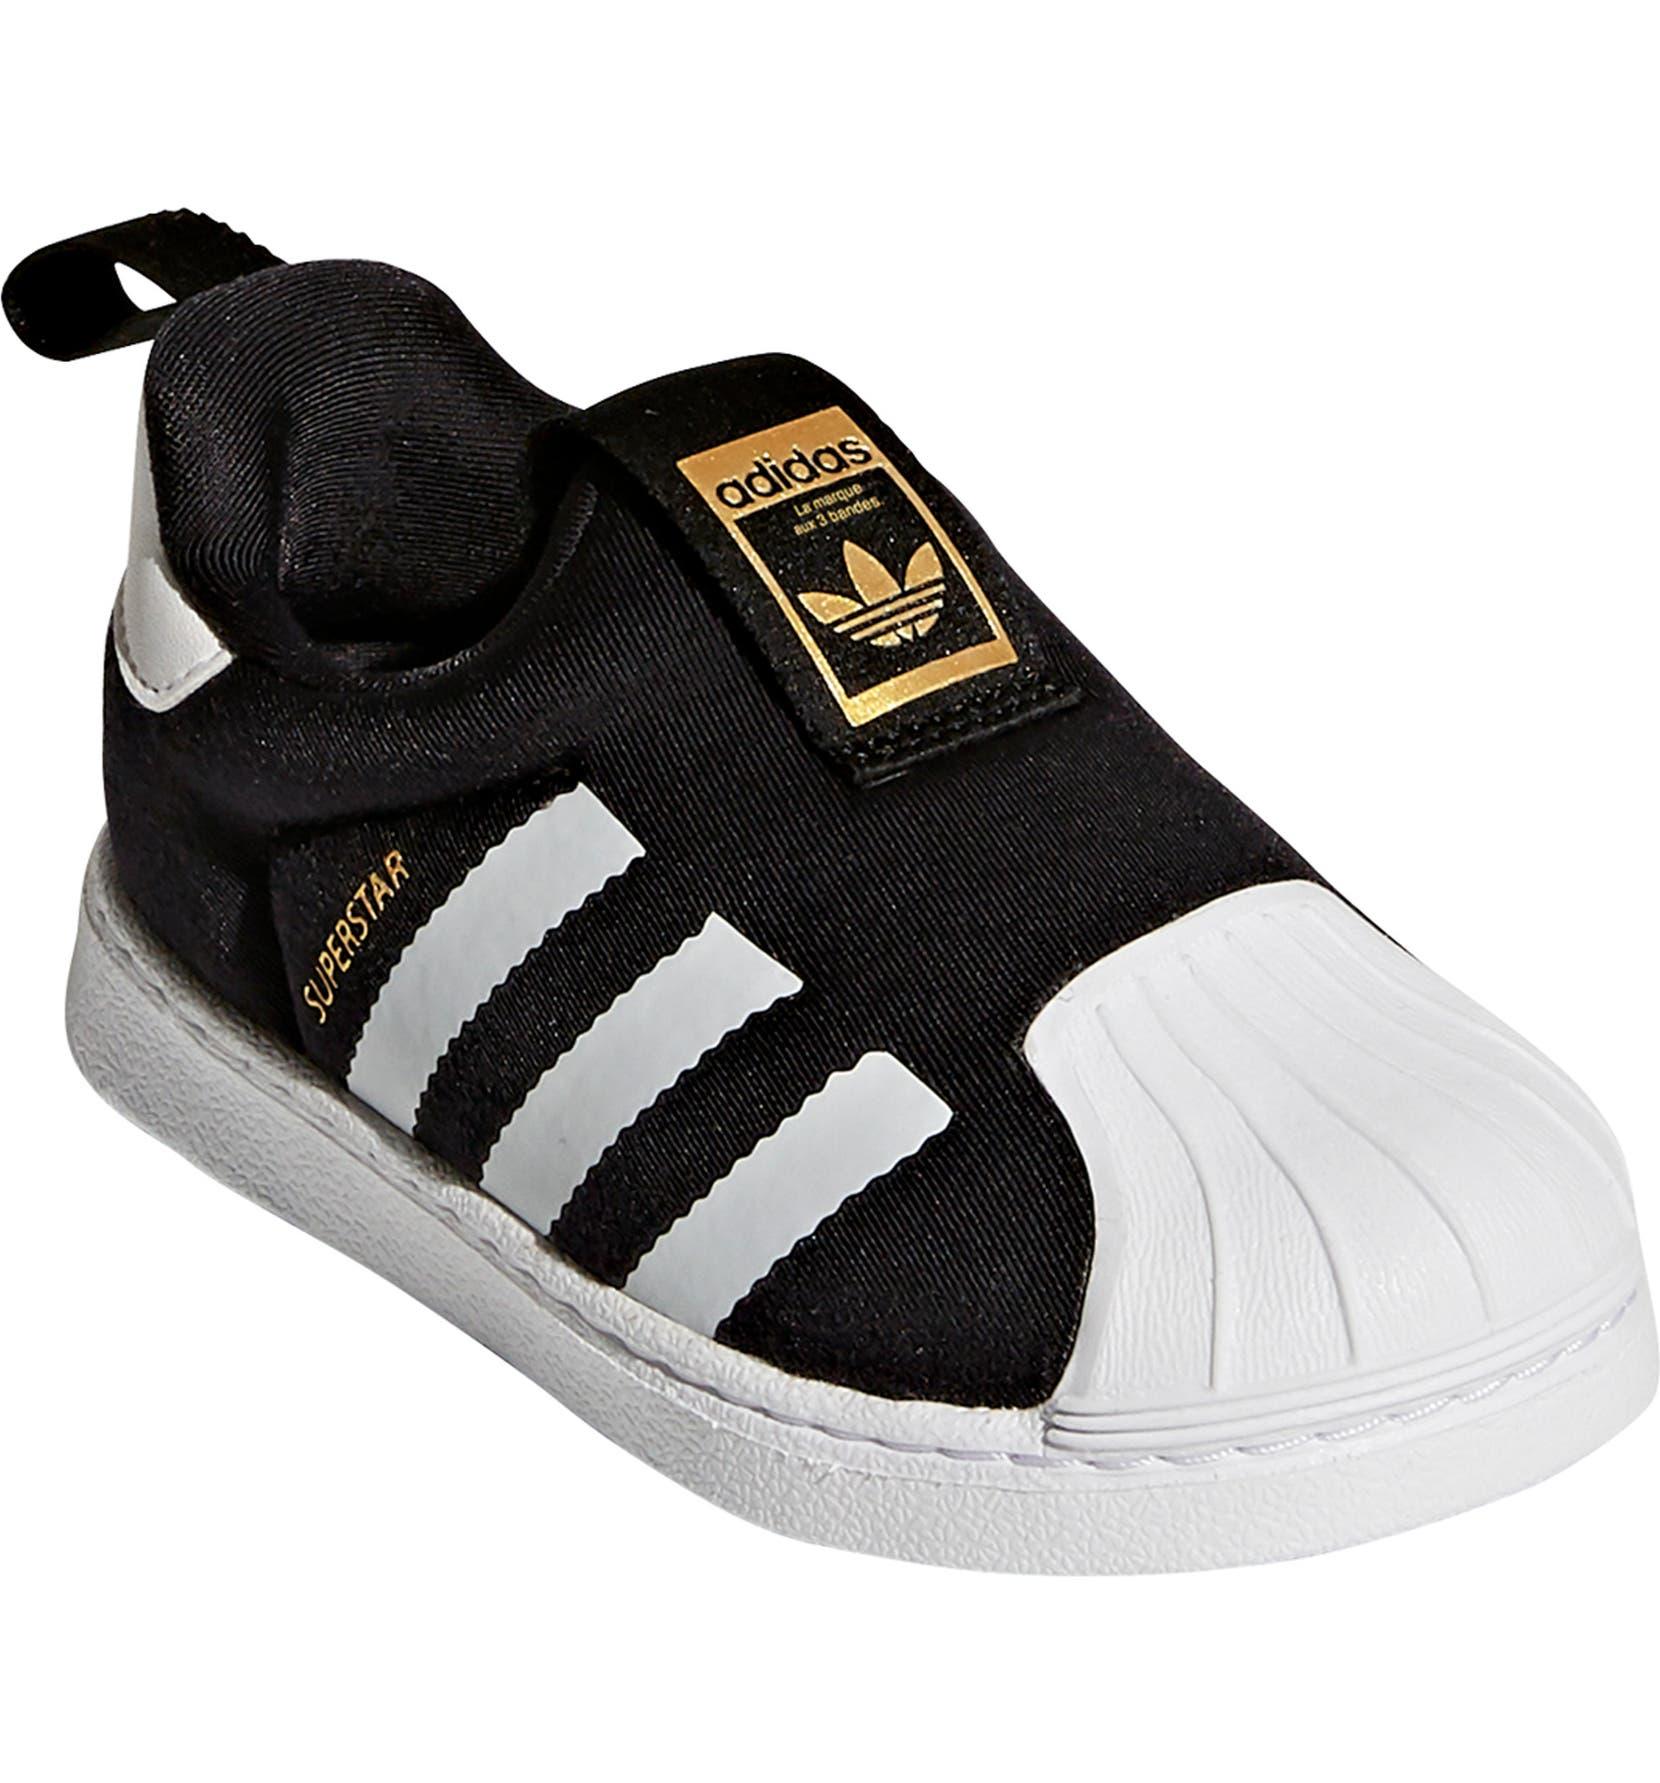 Superstar 360 I Sneaker